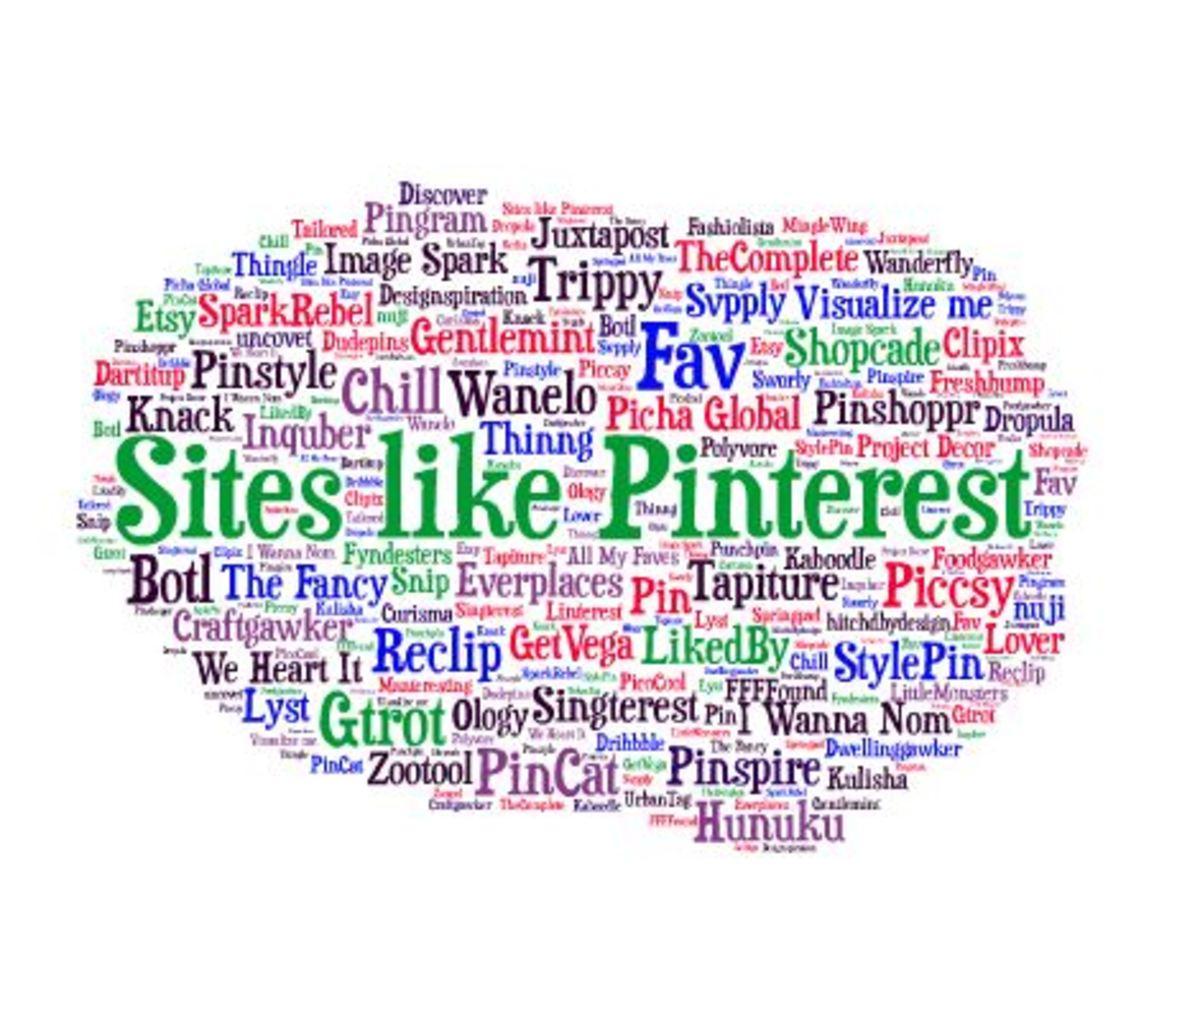 sites-look-like-pinterest-list-of-40-similar-social-media-clone-websites